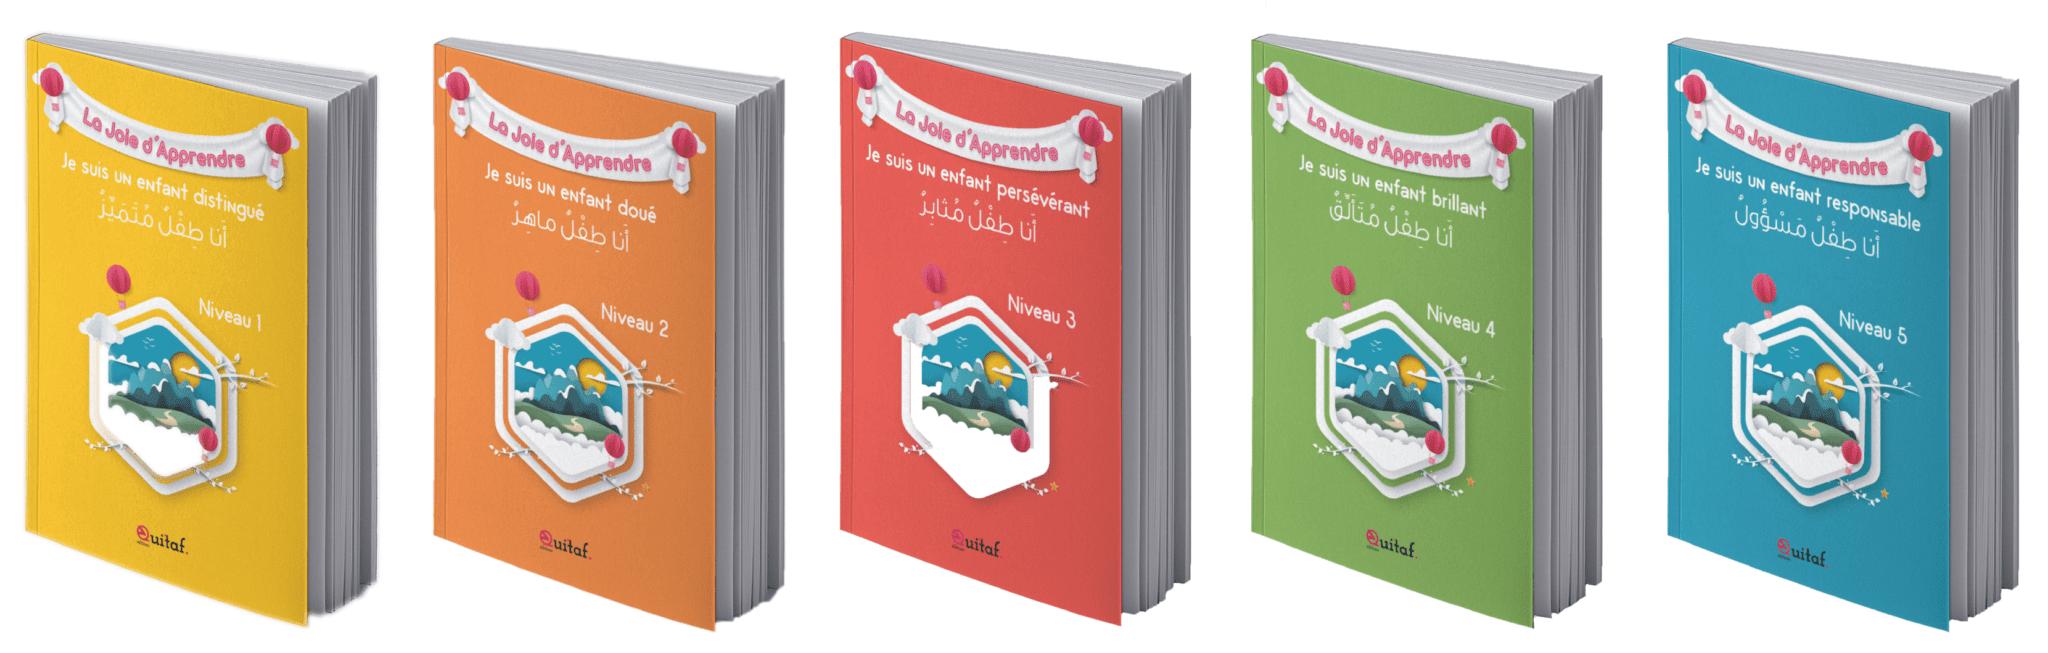 les 5 livres LJA serré_Plan de travail 1